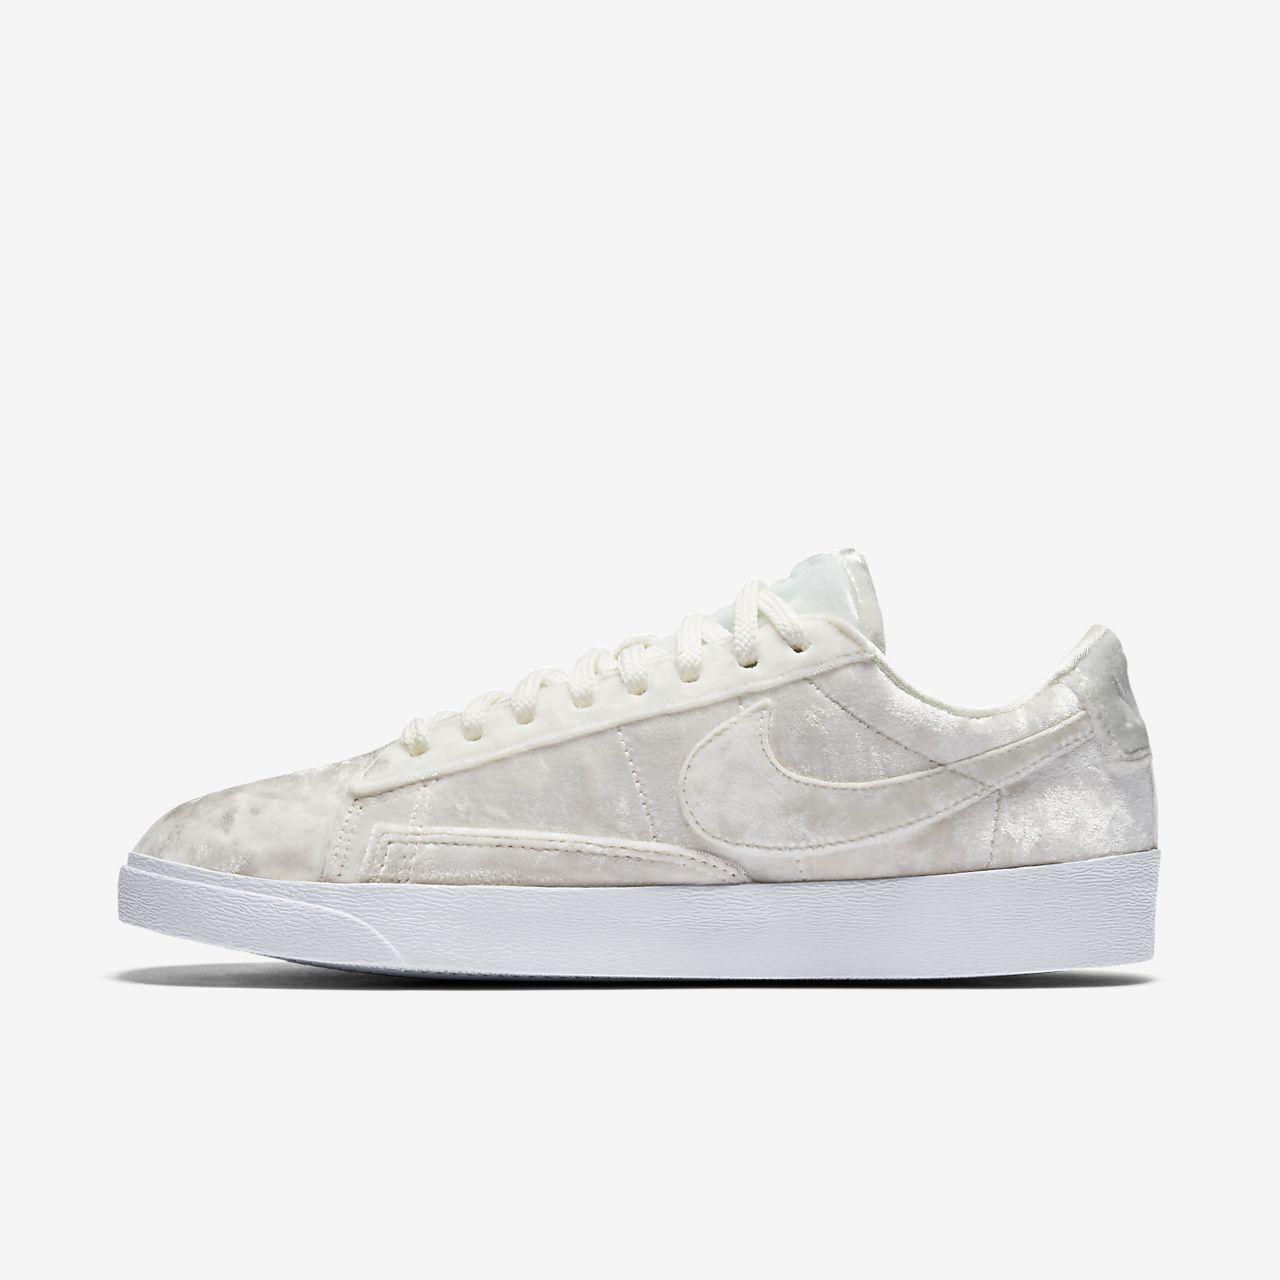 ... Chaussure Nike Blazer Low LX pour Femme